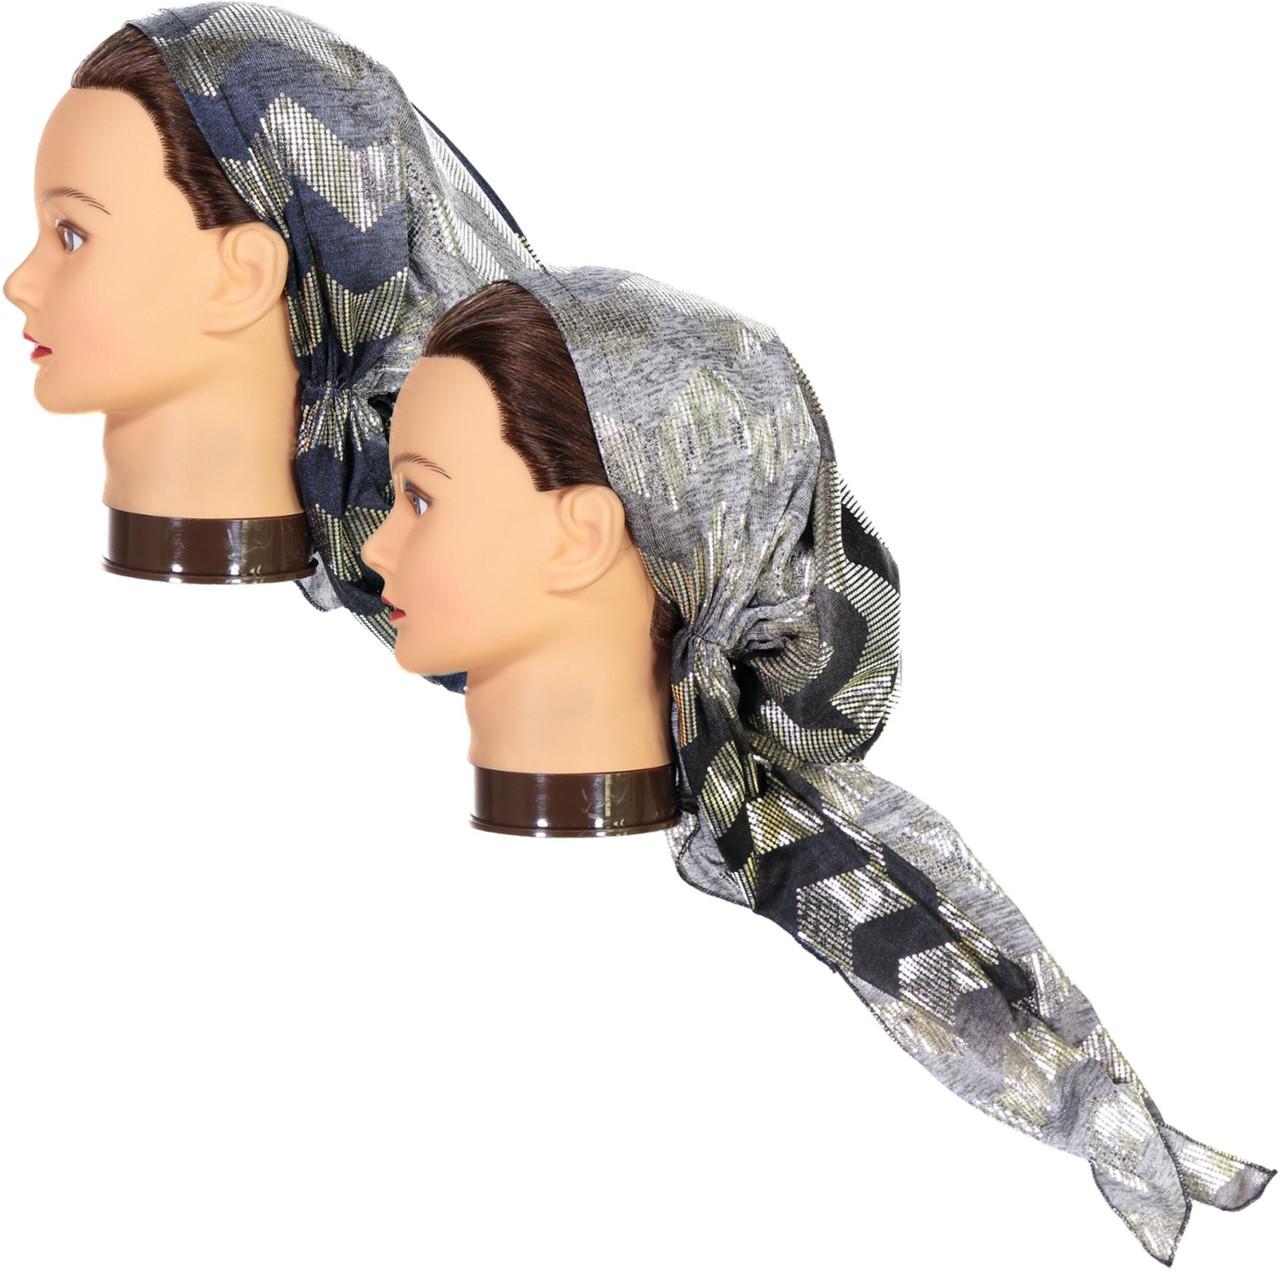 Riqki Womens Silver Chevron Pre-Tied Long Tails Bandana - PTBL1911